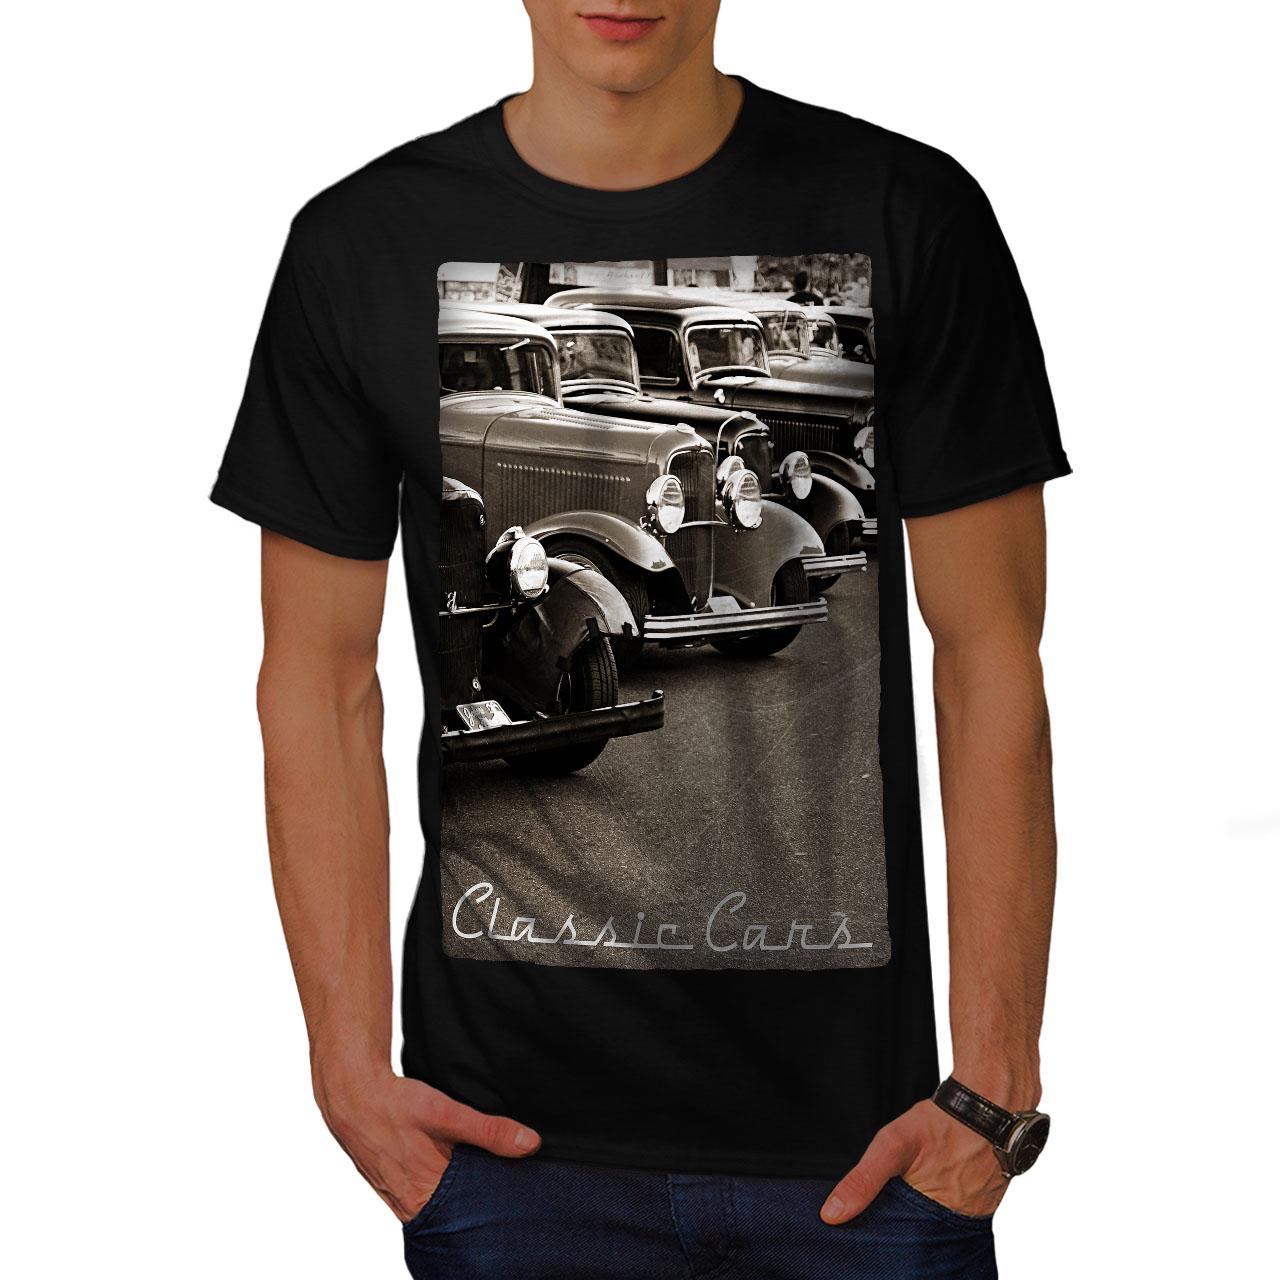 Wellcoda-Classic-Cars-Mens-T-shirt-Retro-Graphic-Design-Printed-Tee thumbnail 3